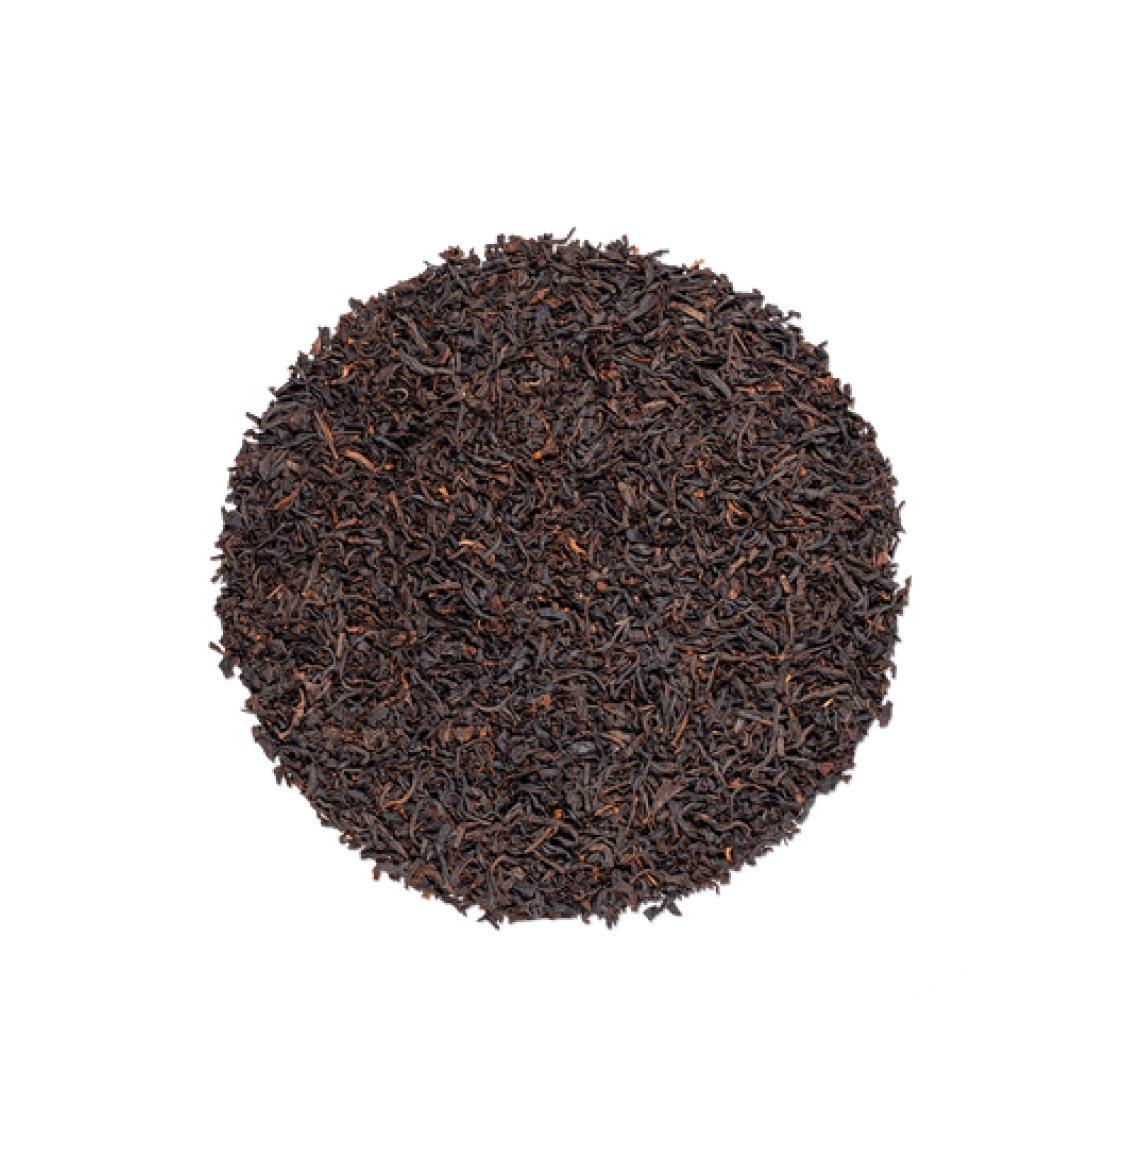 Kusmi Russian Morning N.24 Organic Black Tea 100g